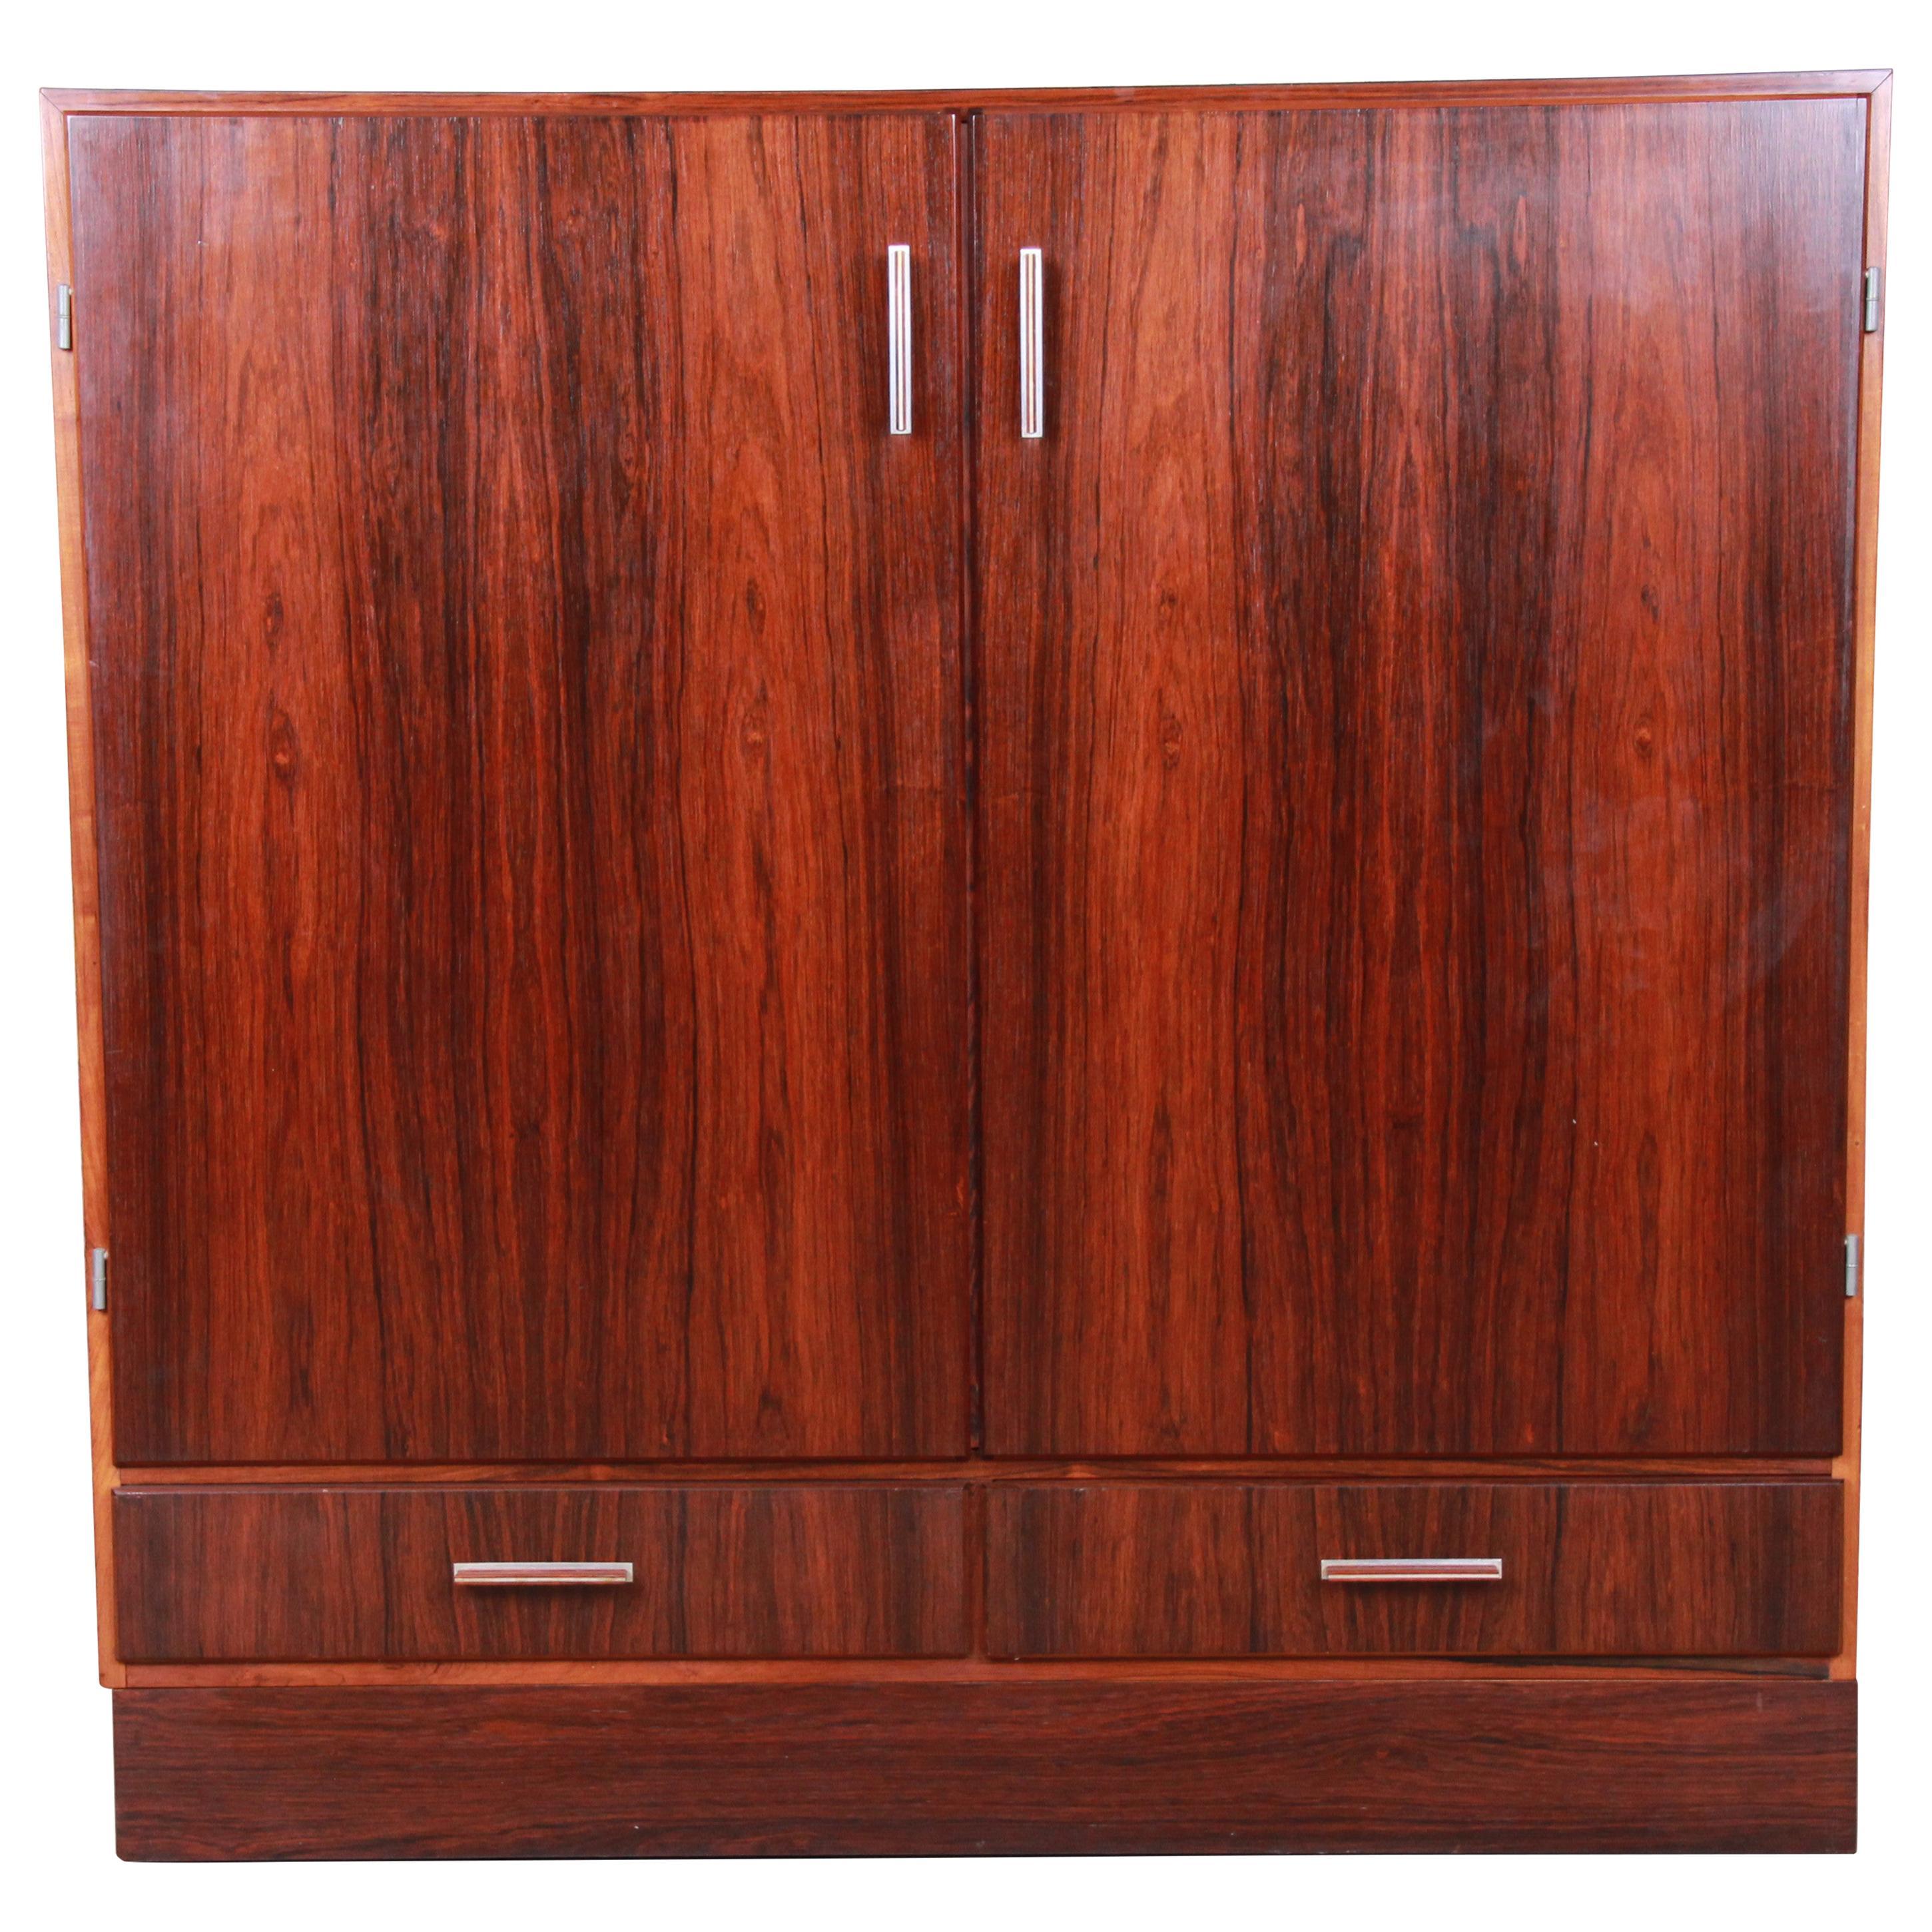 Axel Christiansen Odder Danish Modern Brazilian Rosewood Bar Cabinet, 1960s